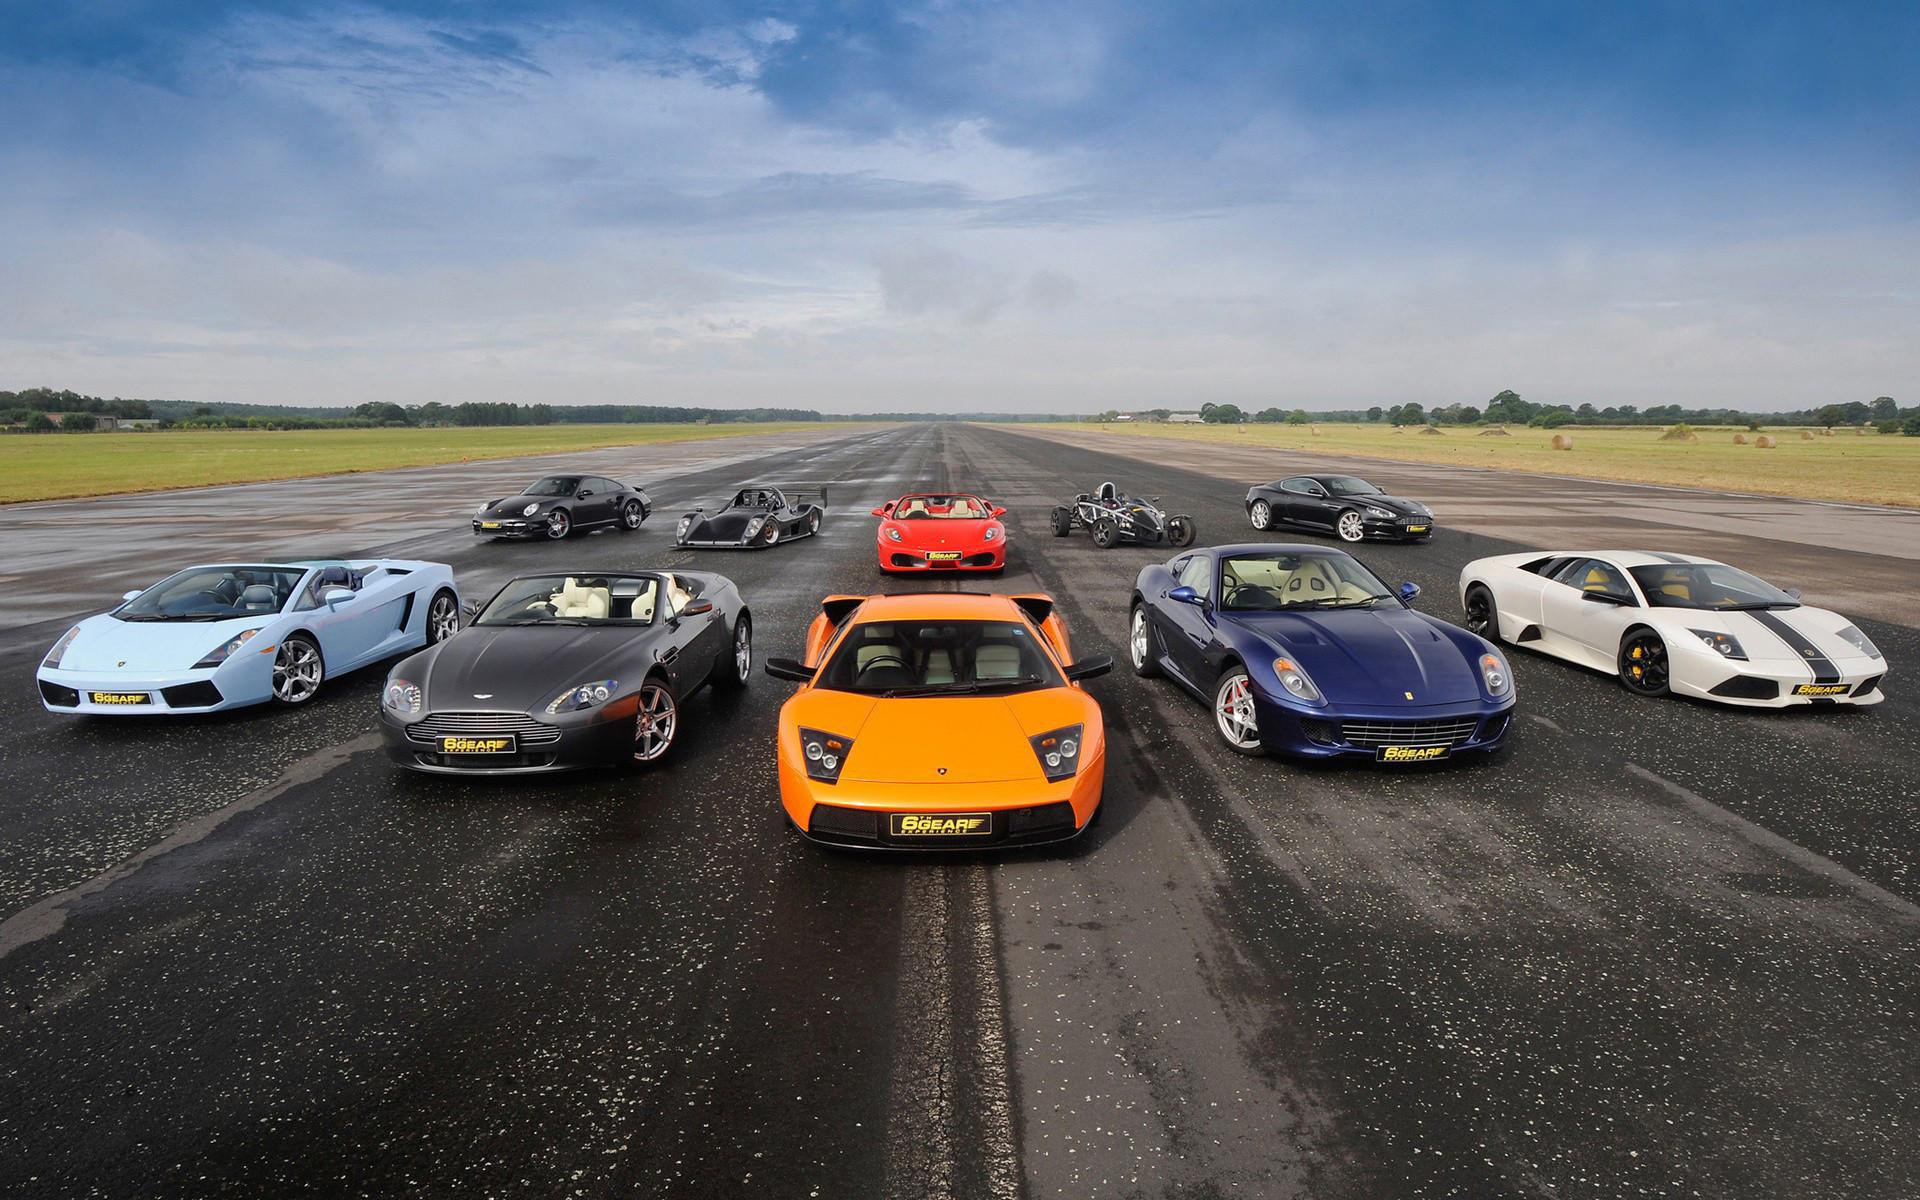 1920x1200 6th Gear Racing Cars